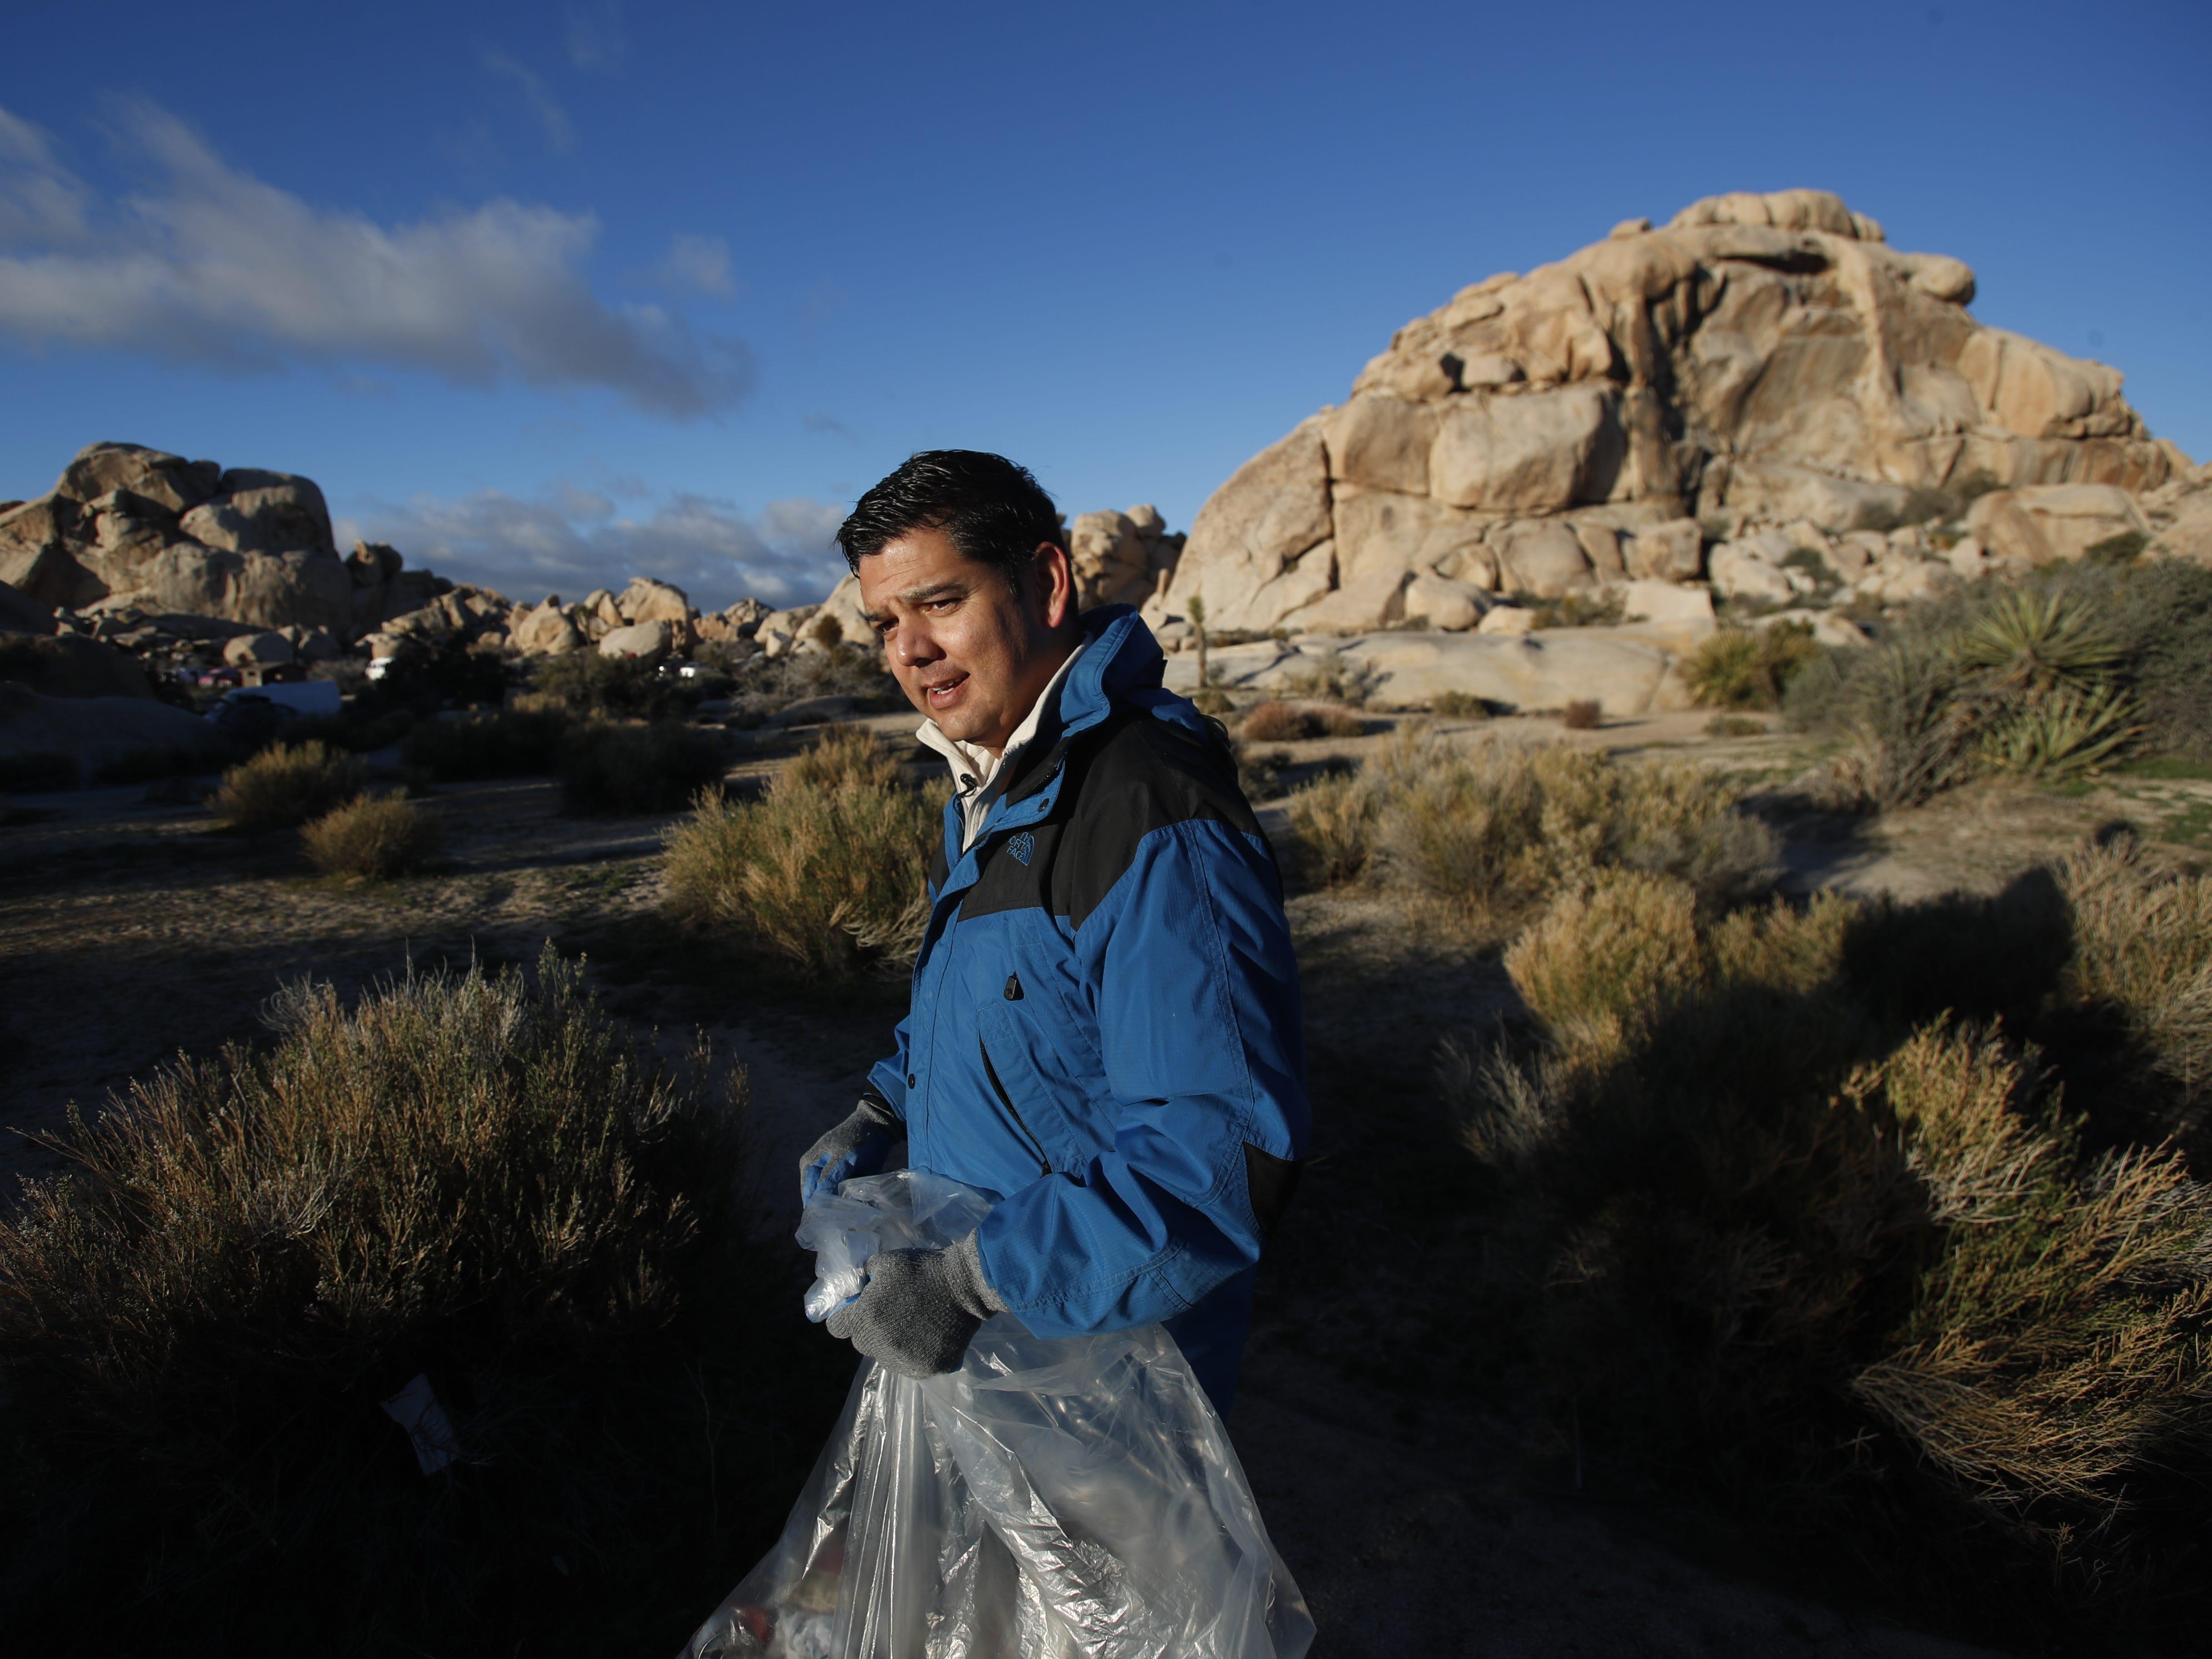 At Joshua Tree National Park, Rep. Raul Ruiz surveys effects of government shutdown